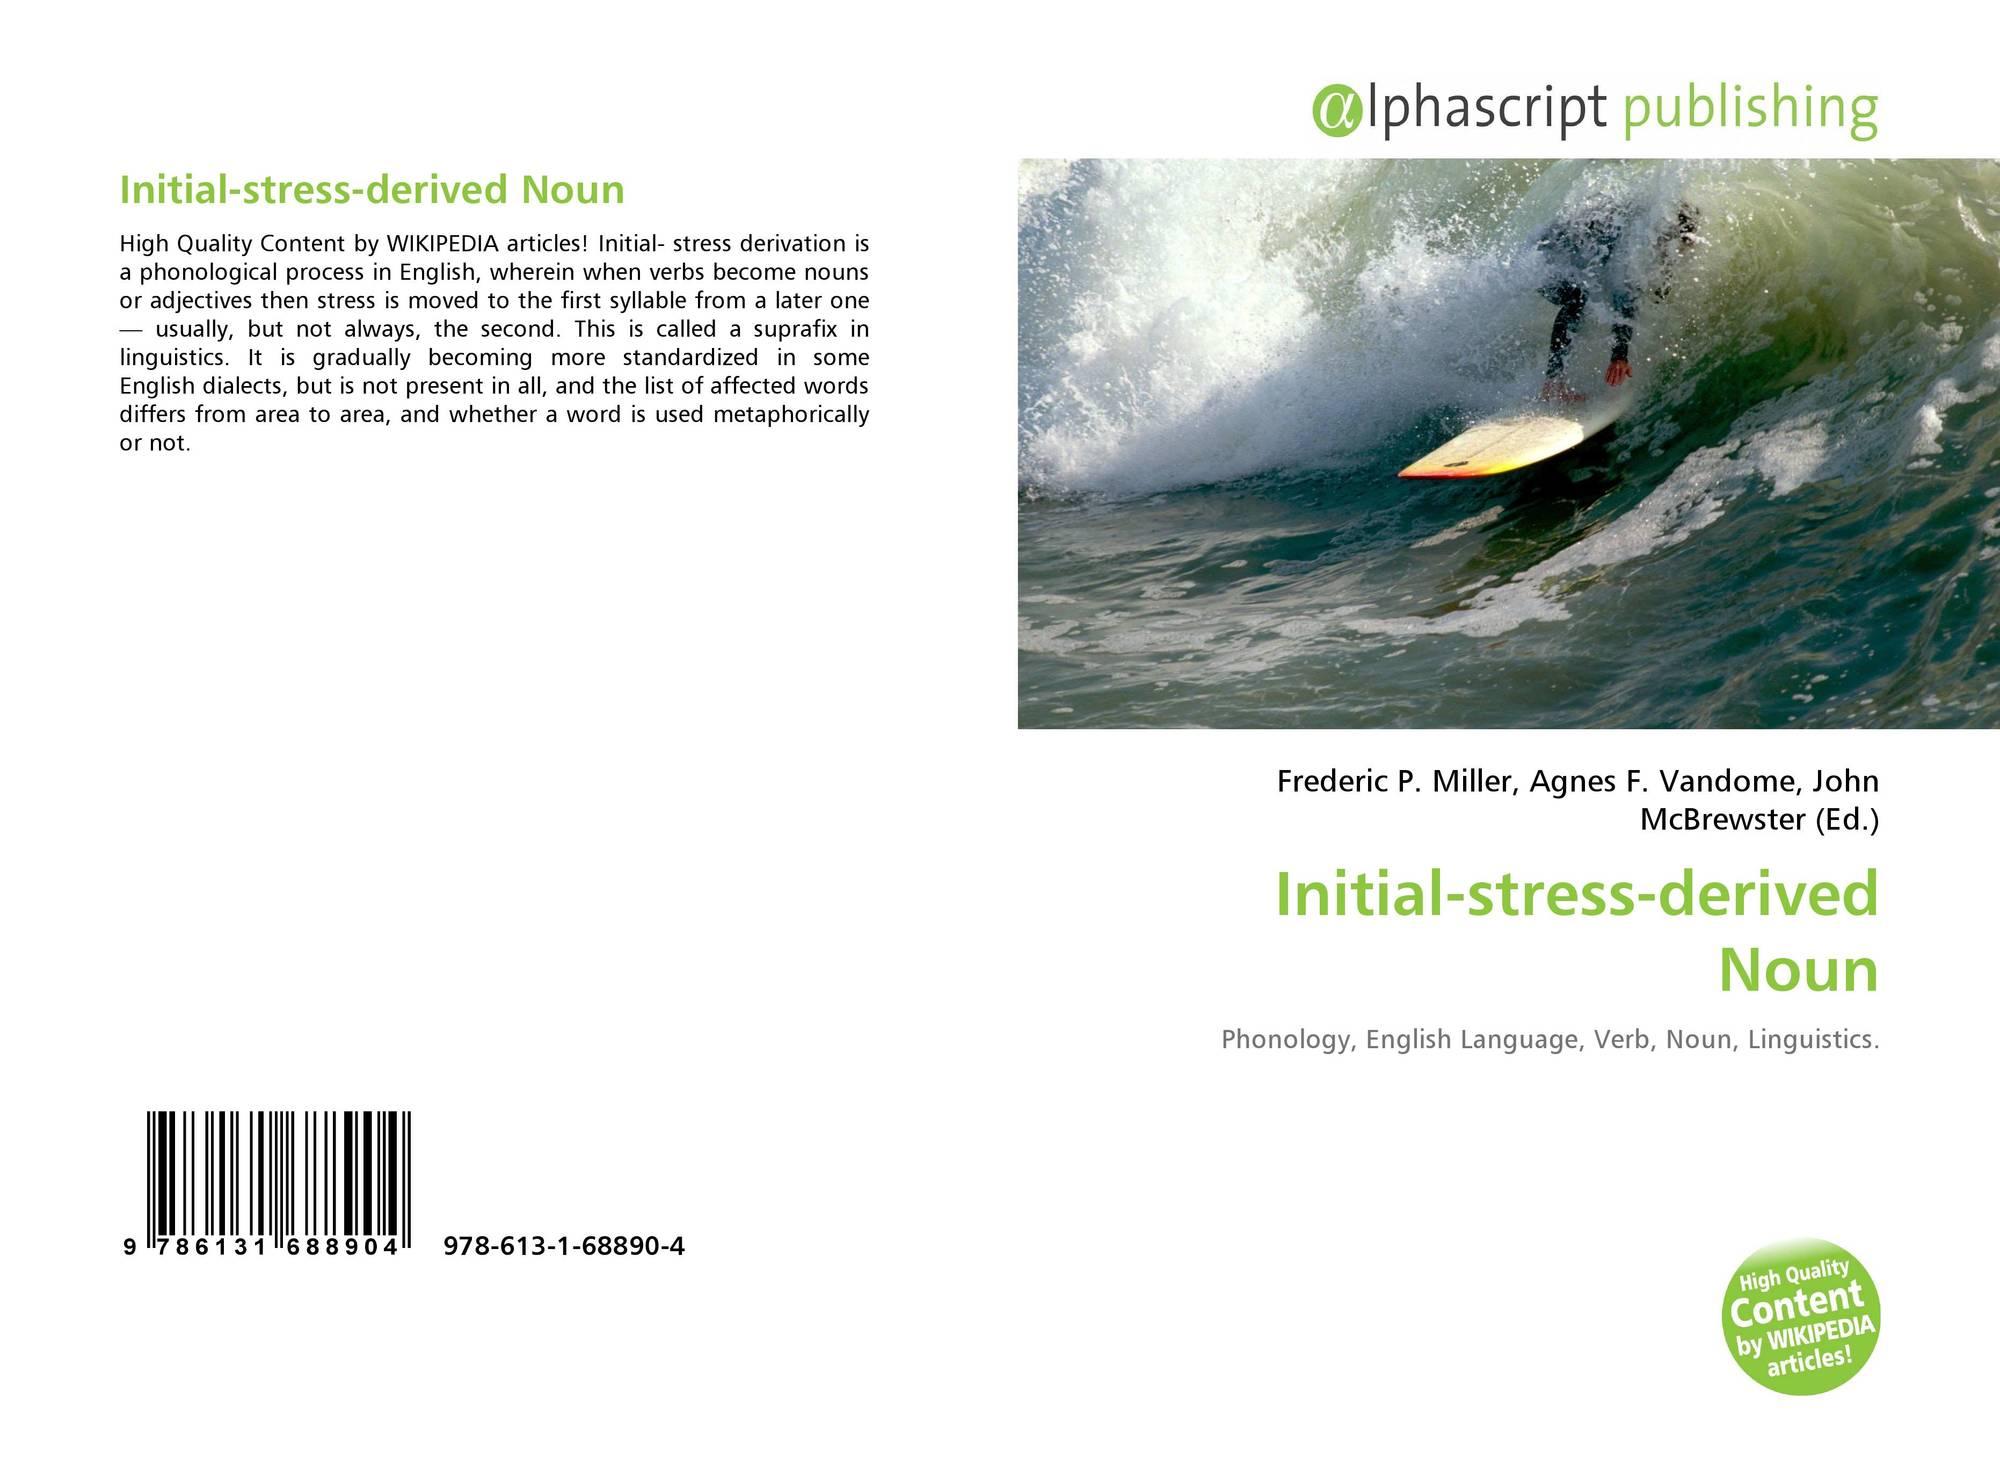 Initial-stress-derived Noun, 978-613-1-68890-4, 6131688907